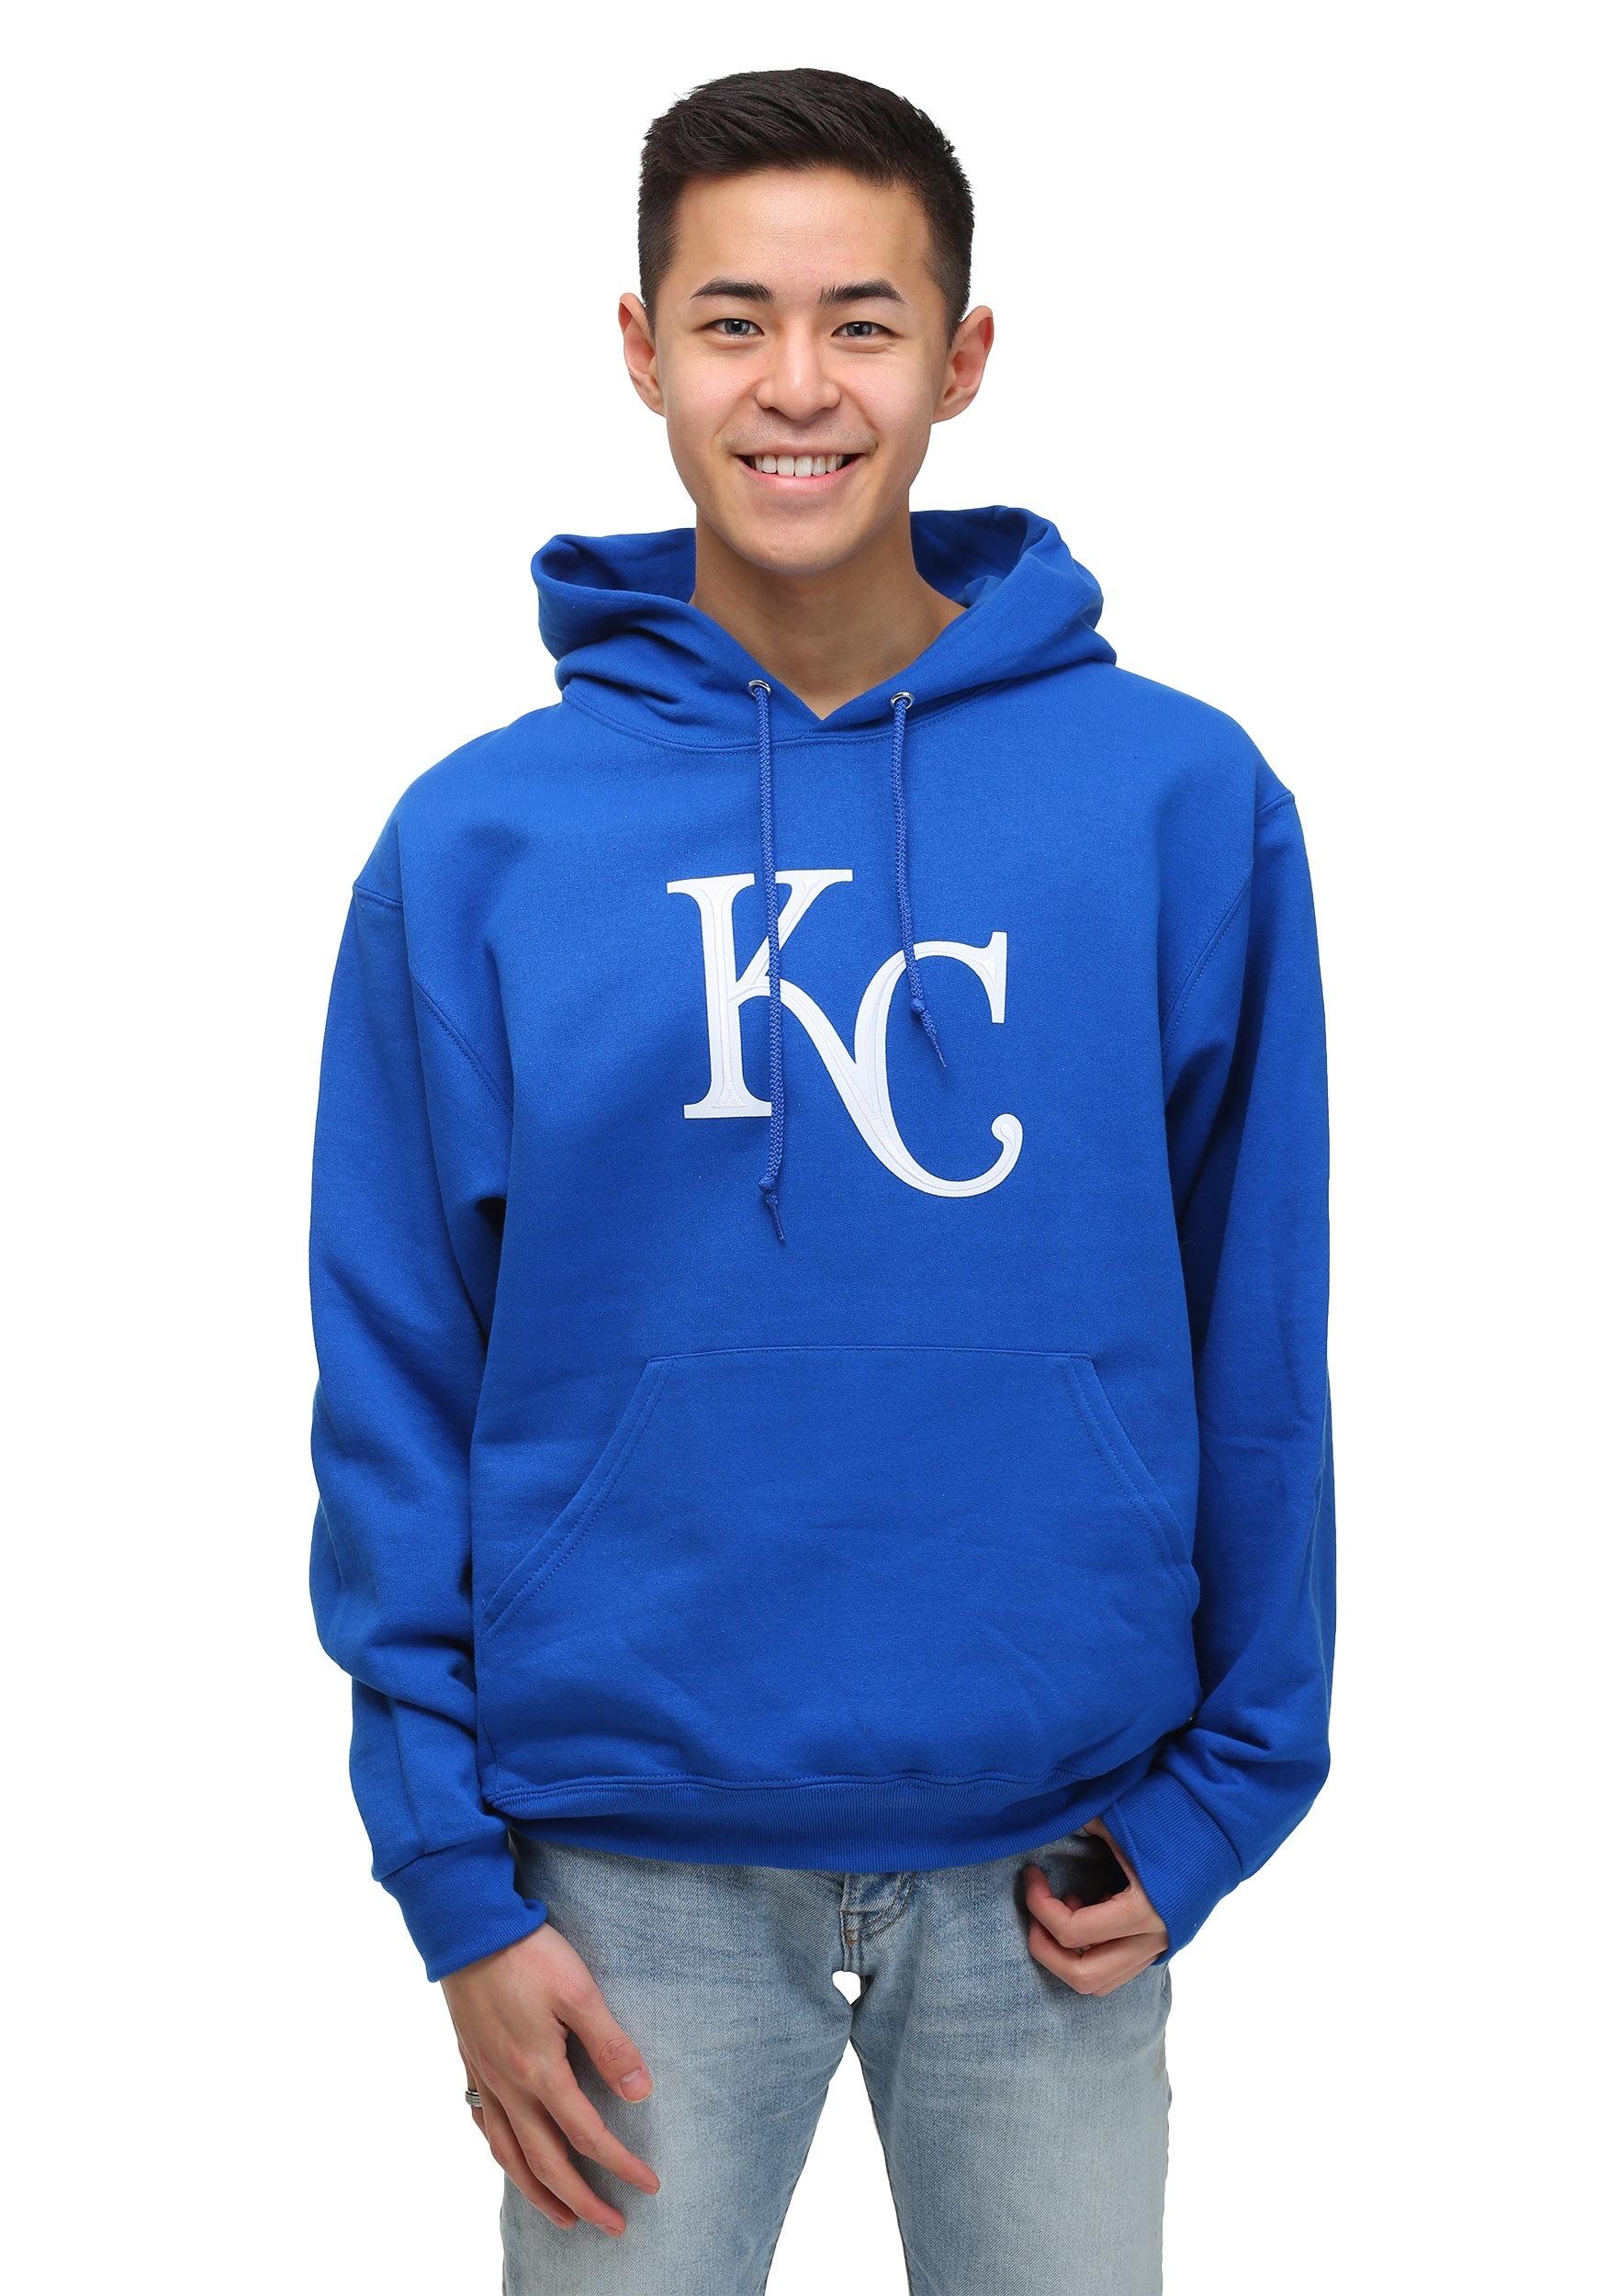 Kansas City Royals Scoring Position Men's Hooded Sweatshirt